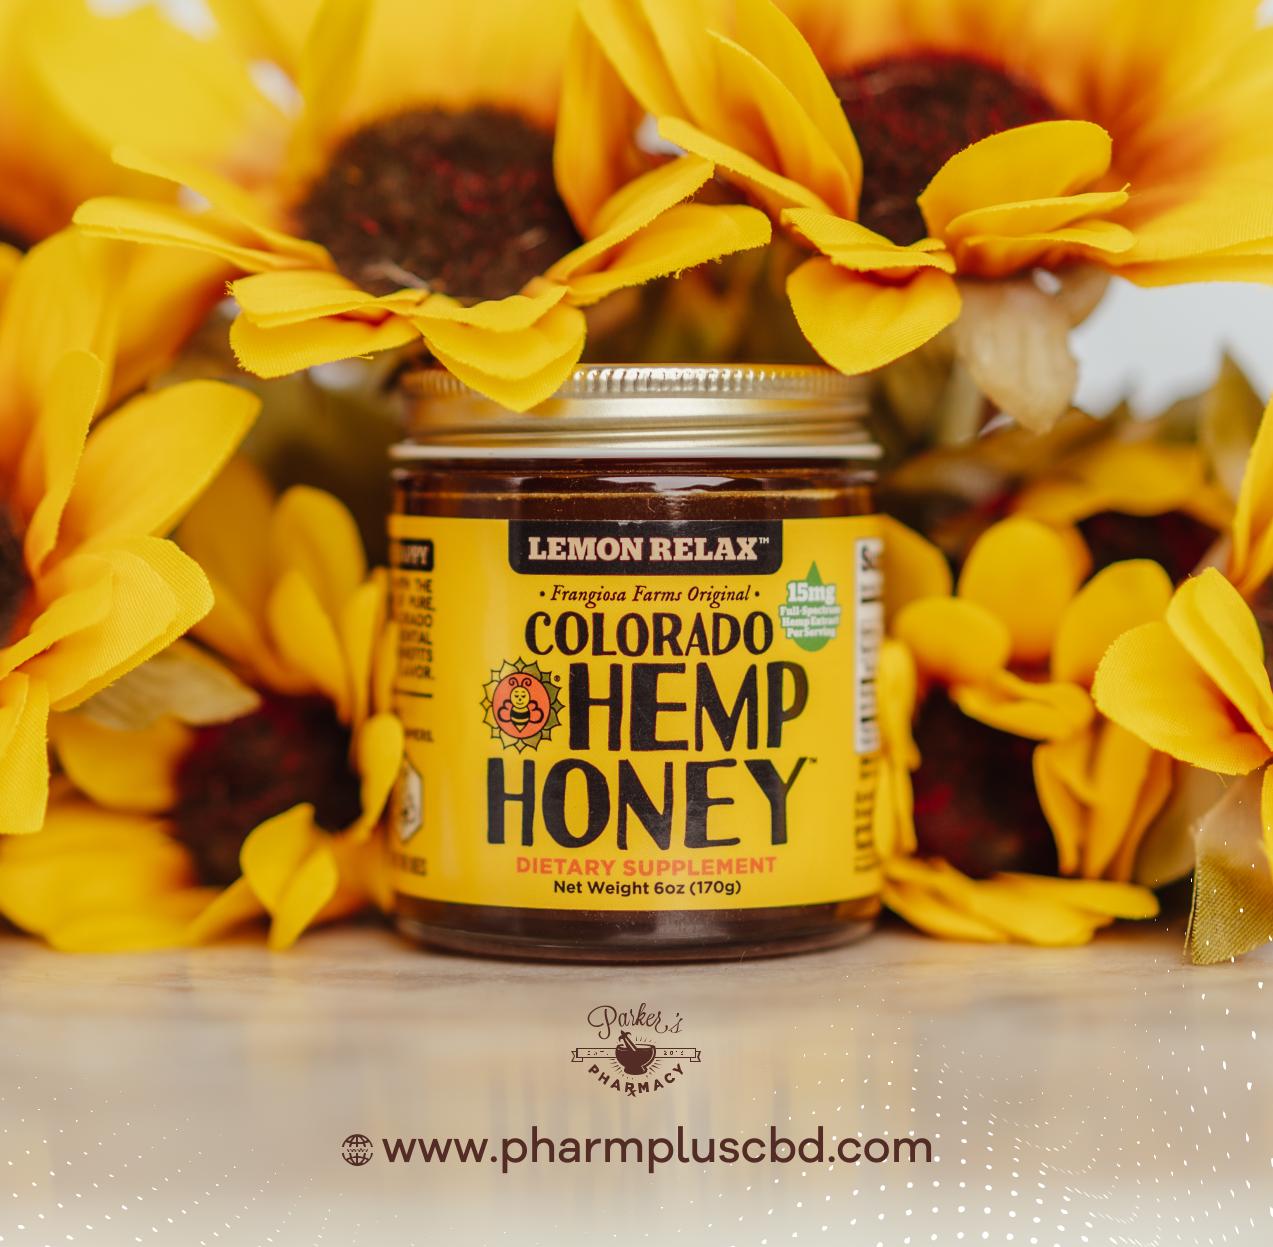 Colorado Hemp Honey Lemon Relax 6oz Jar